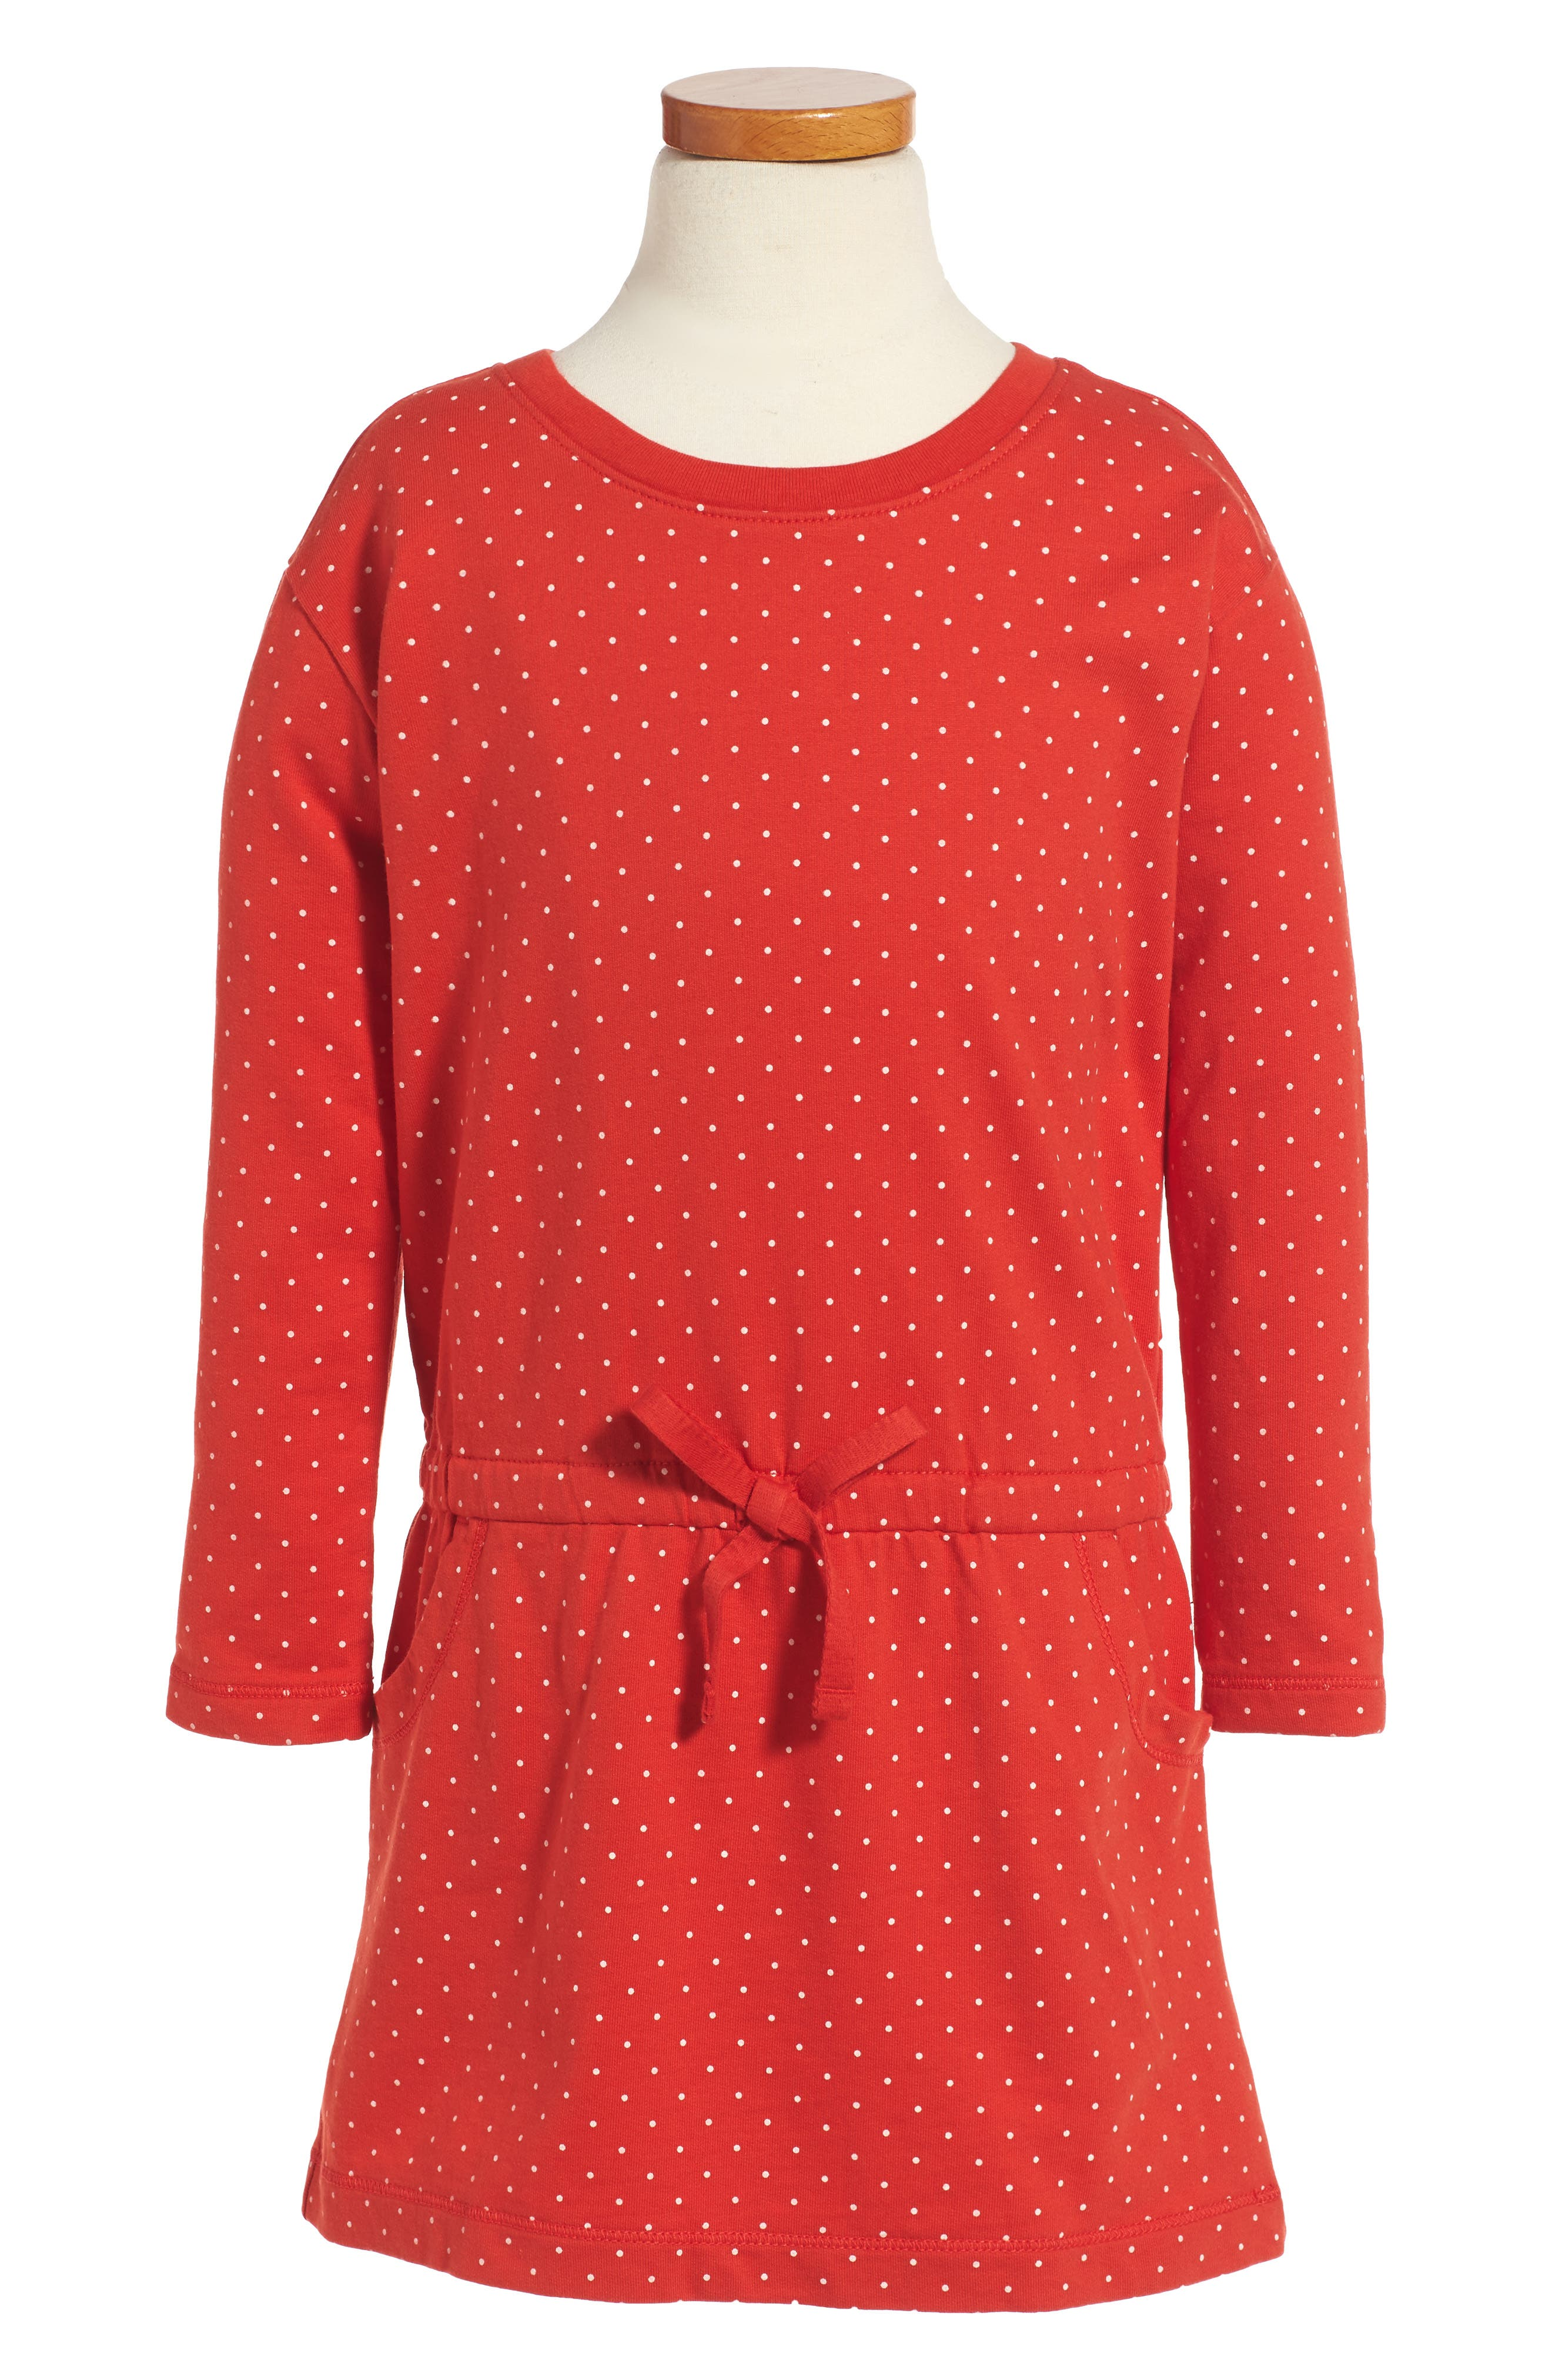 Dotty Dress,                         Main,                         color, 629